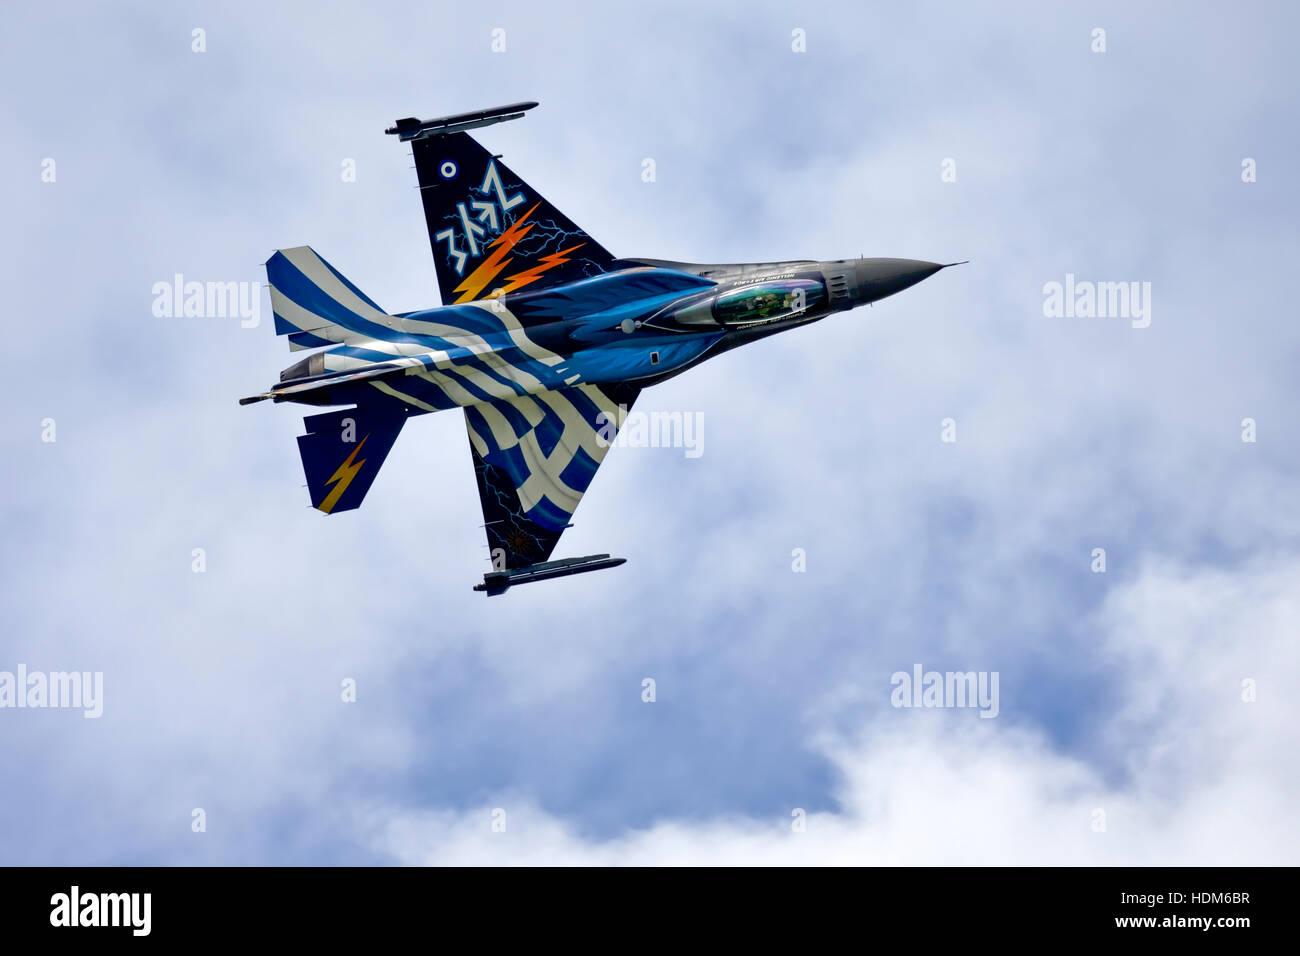 L'équipe de démo Zeus Lockheed Martin F-16C Fighting Falcon de 340/343 Mira, Hellenic Air Force, Souda, à RIAT 2016, RAF Fairford, UK. Banque D'Images